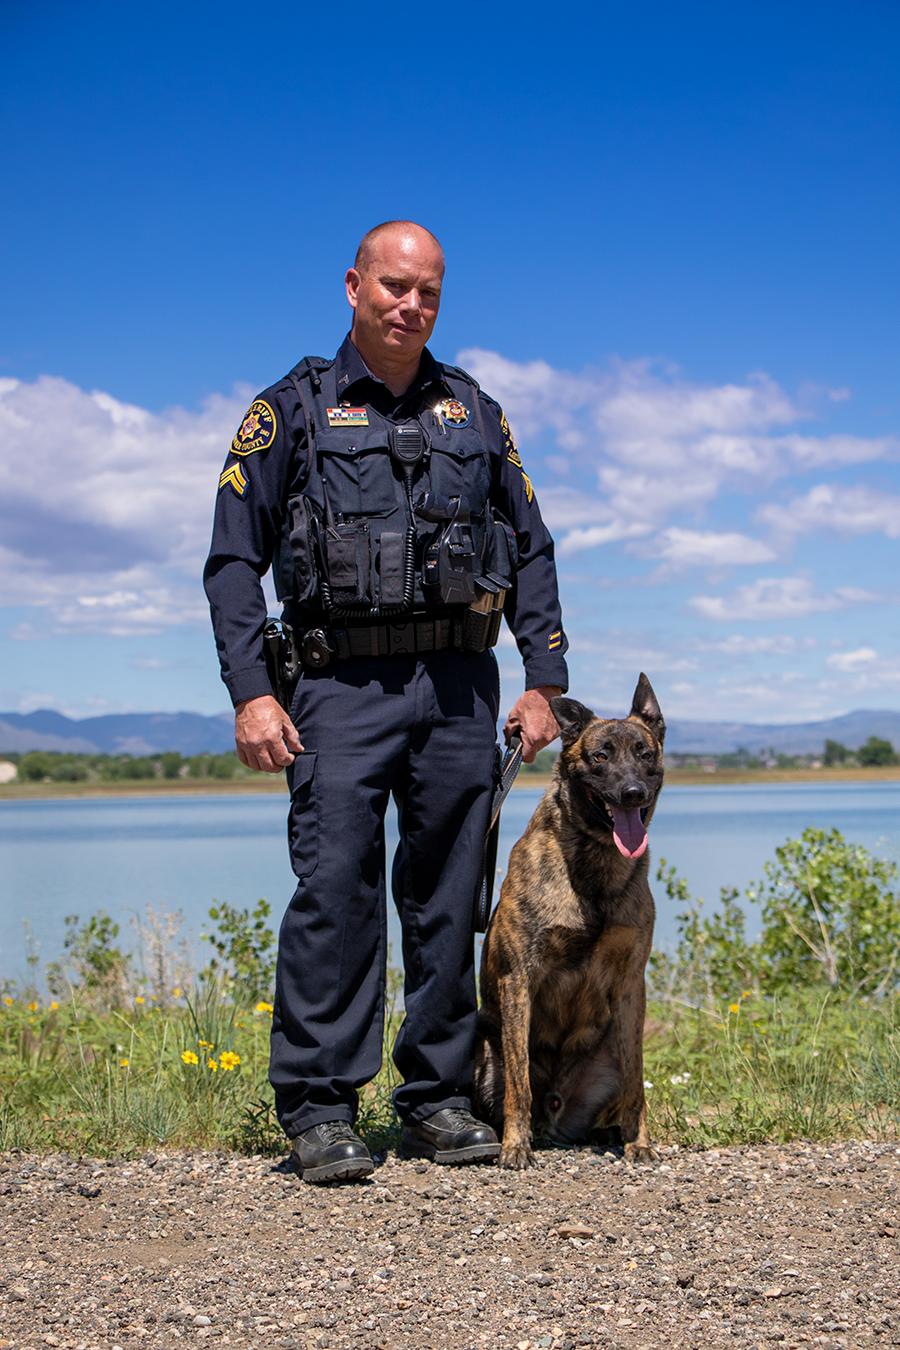 Image 3: Corporal Jamie Smith and K9 Cash (Dutch Shepherd)